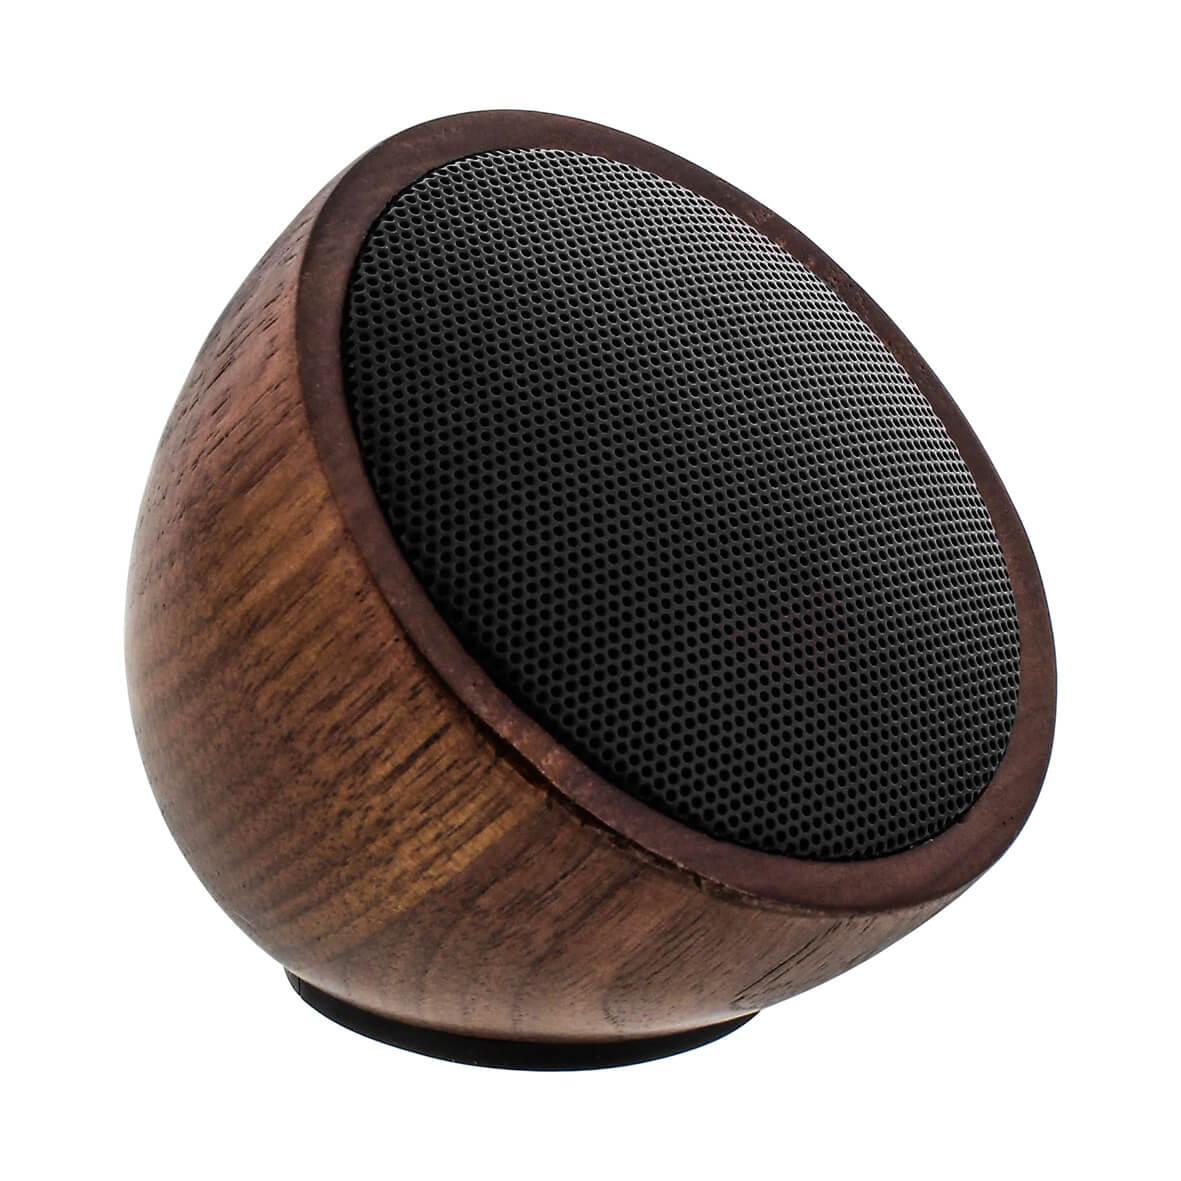 InLine Woodwoom - Mini-Bluetoothlautsprecher aus Walnussholz 🎵 3